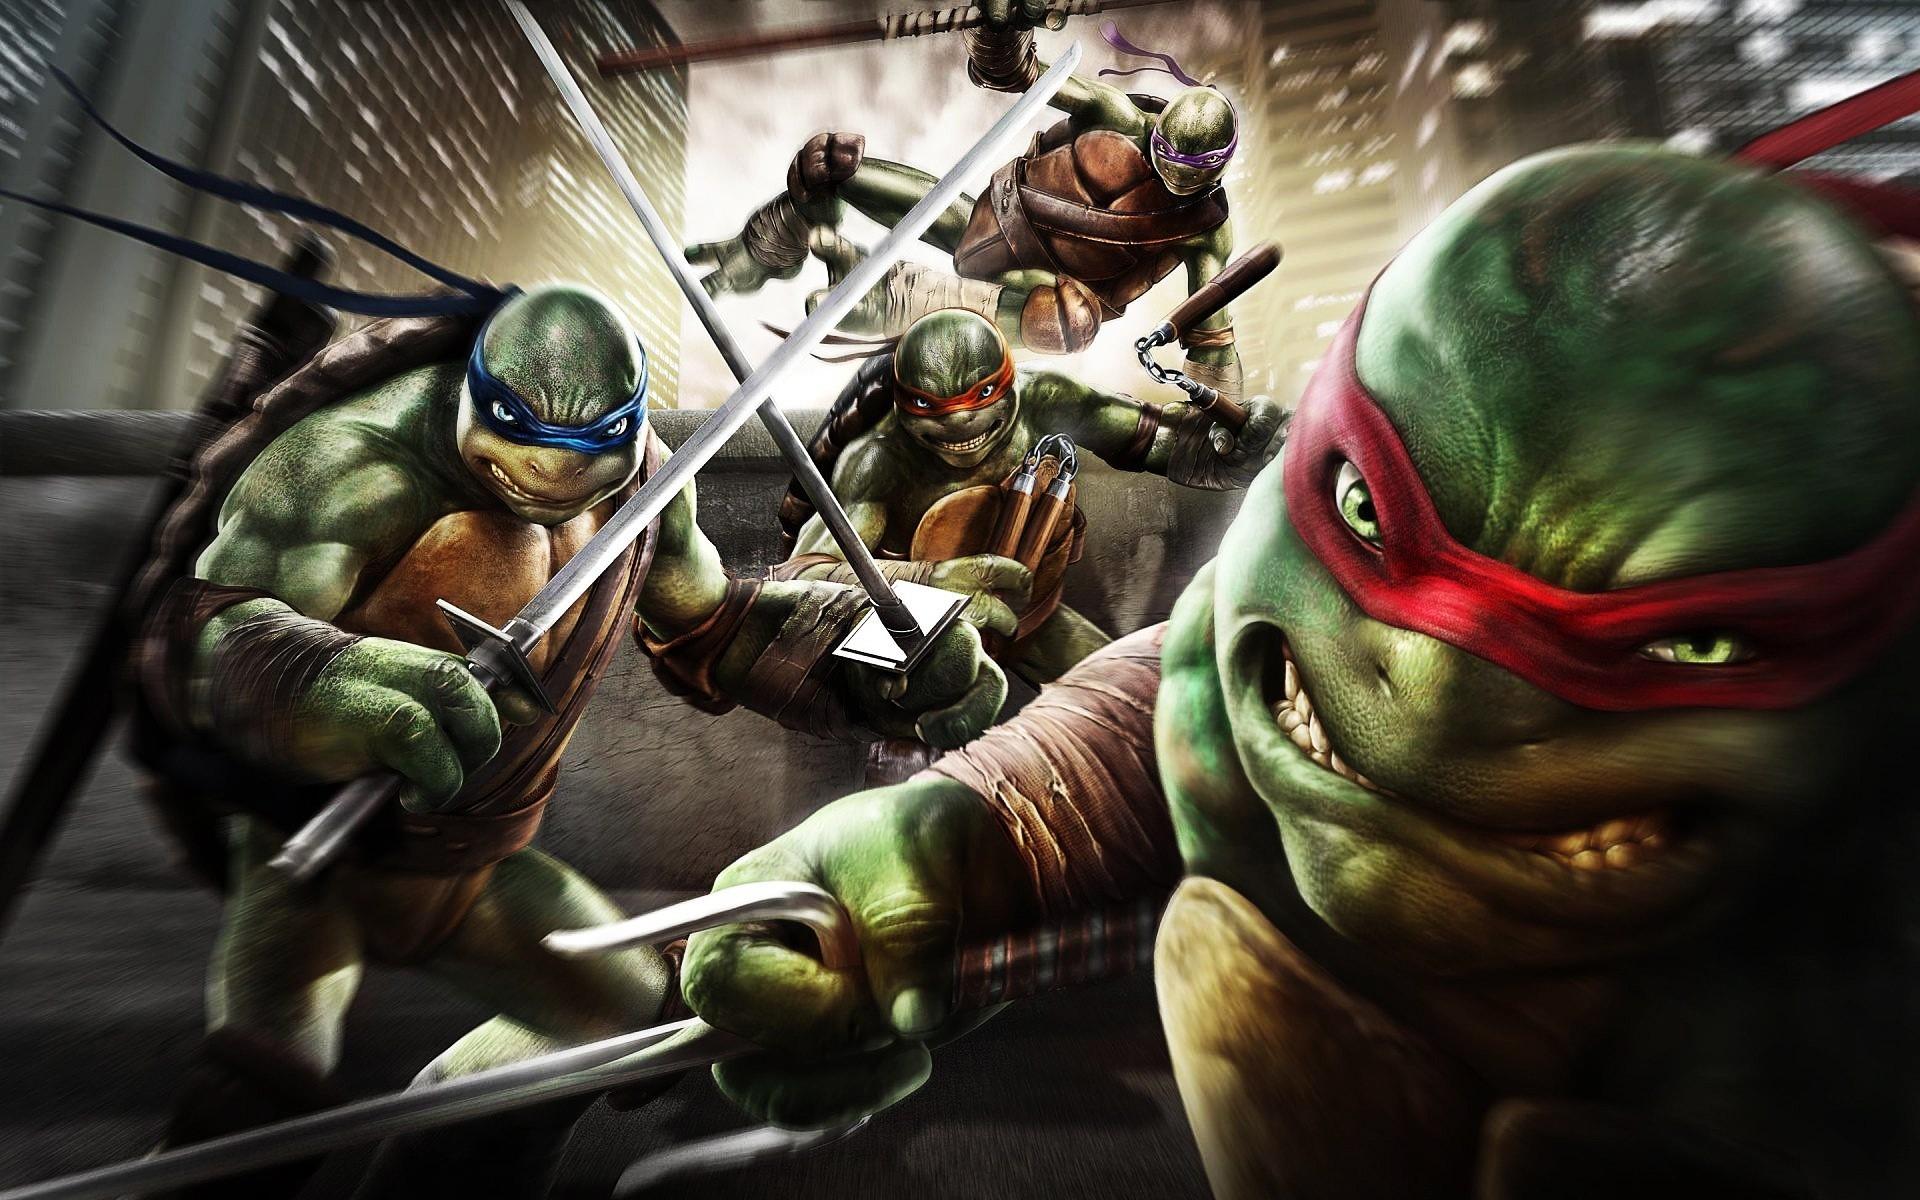 Teenage Mutant Ninja Turtles Out Of The Shadows Free Wallpapers